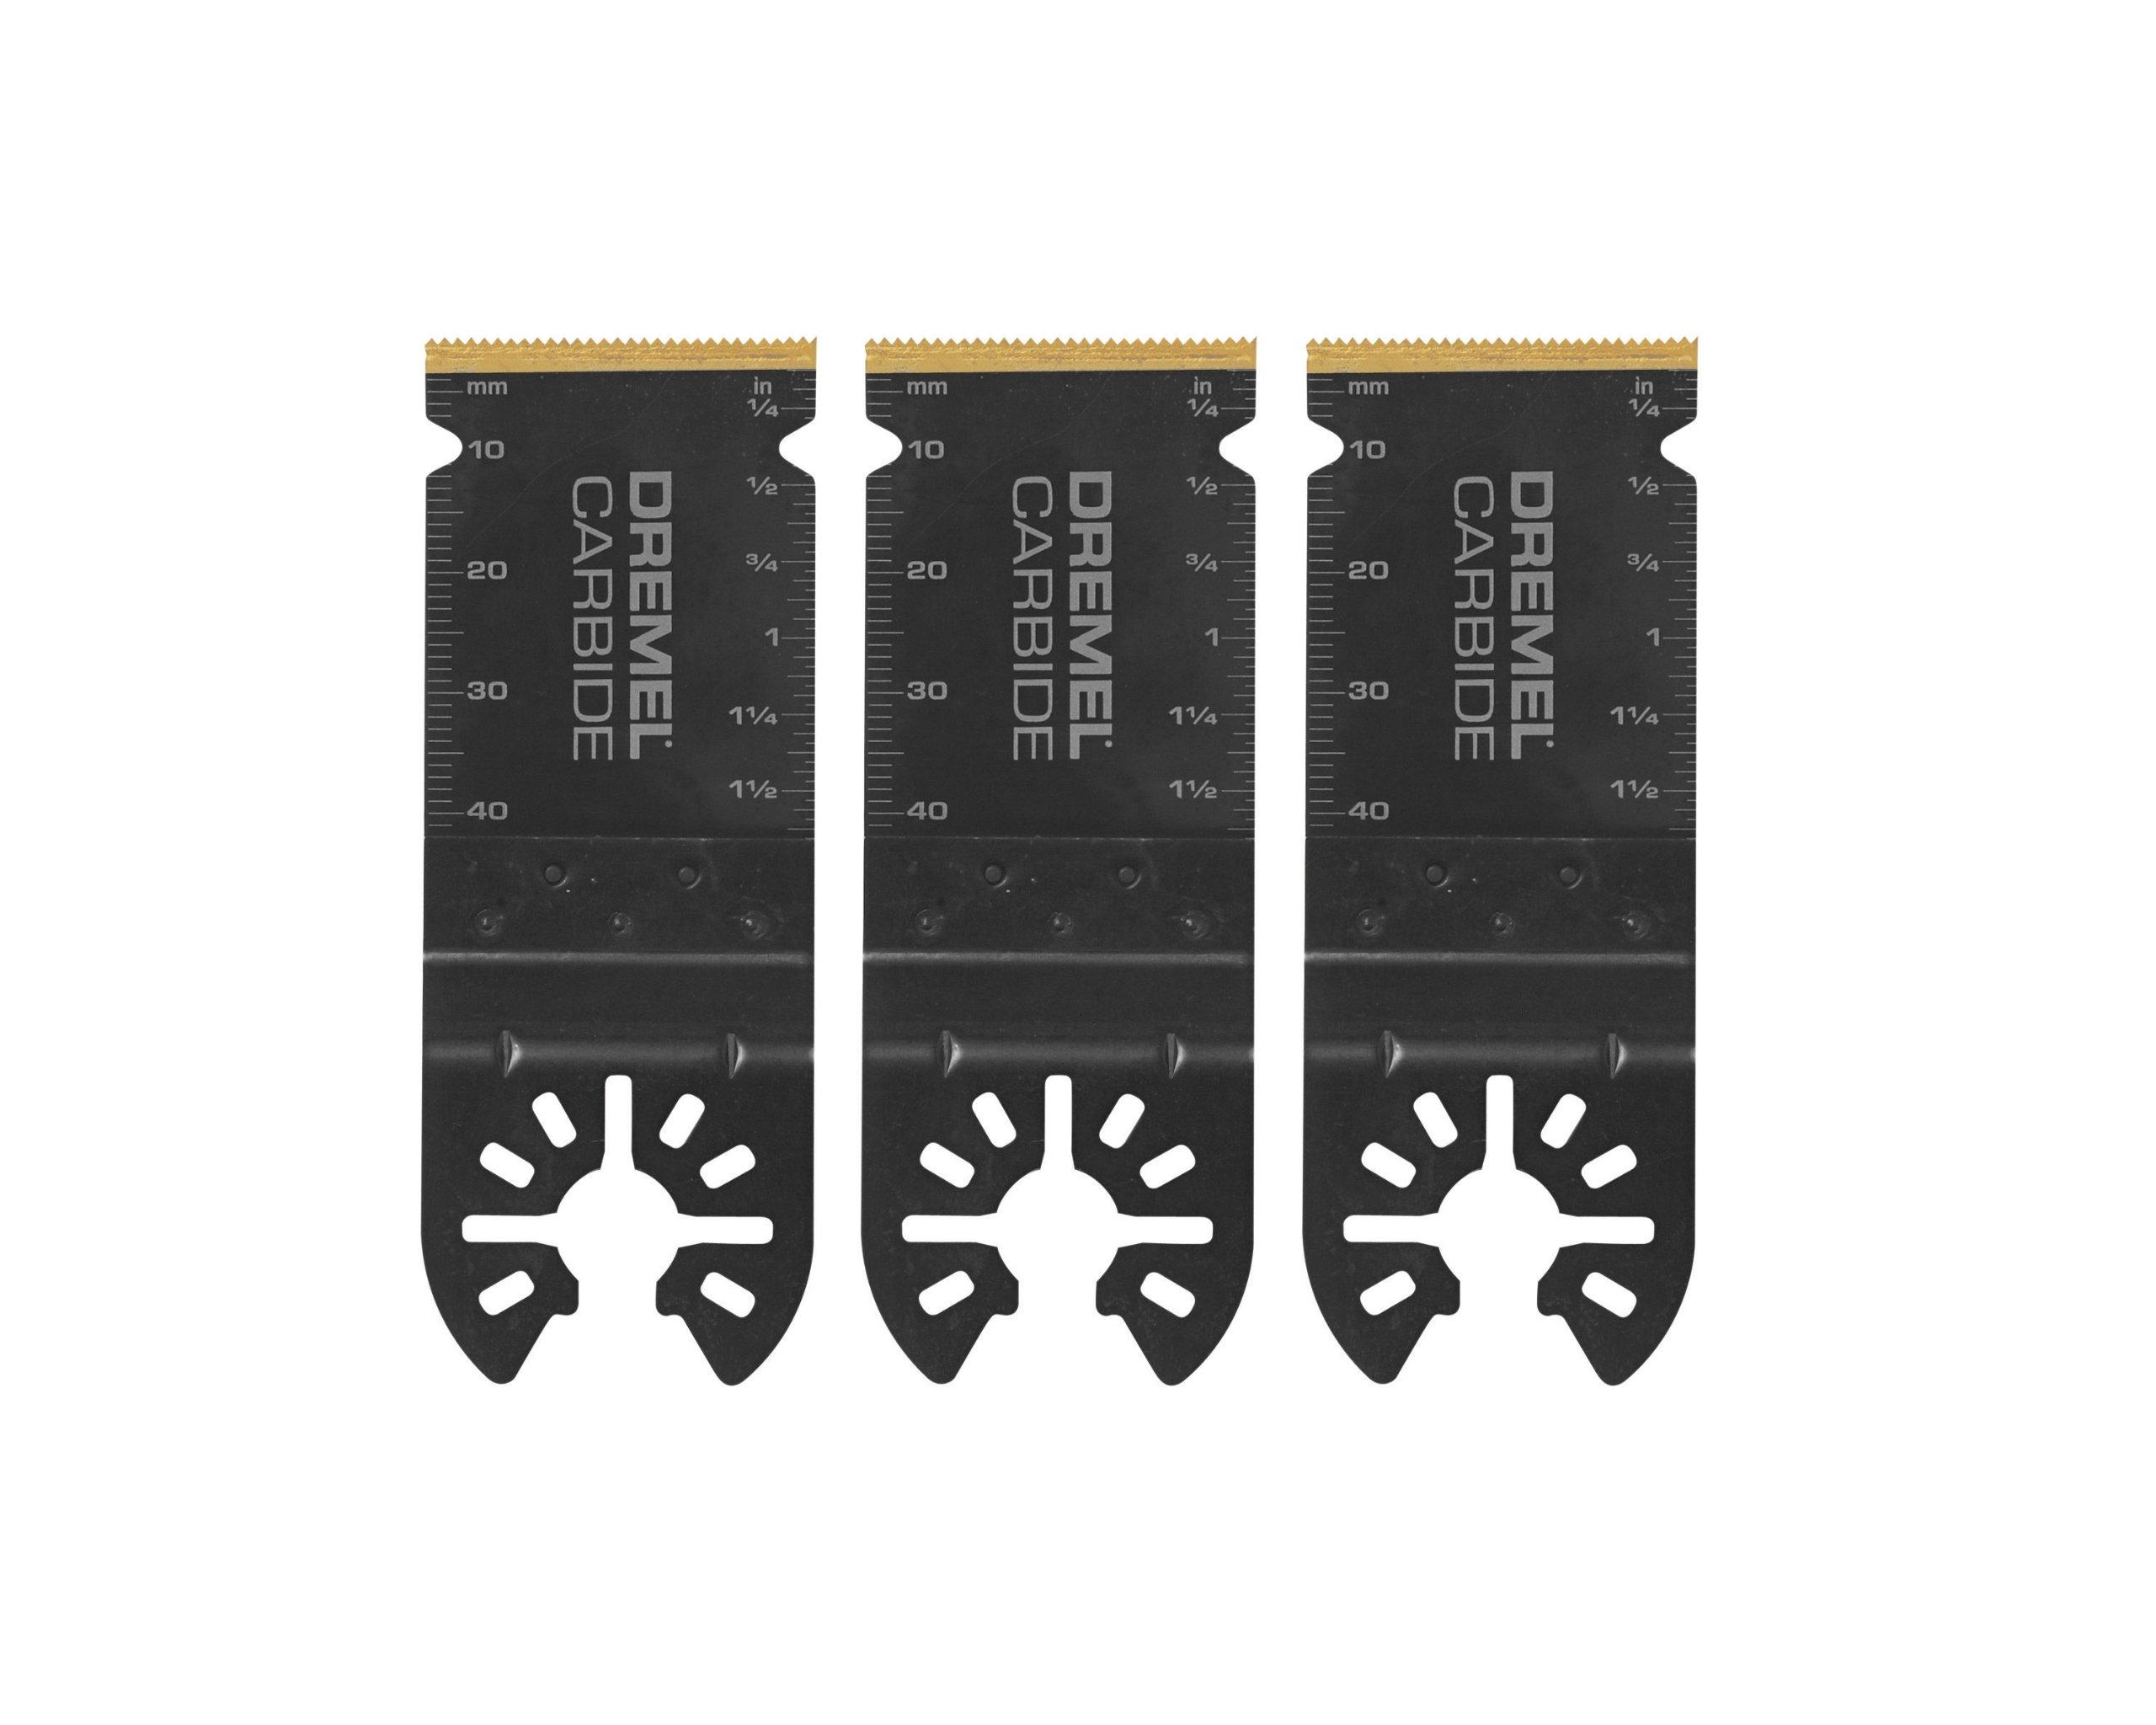 Dremel MM485B Carbide Flush Cutting Blades, Pack of 3